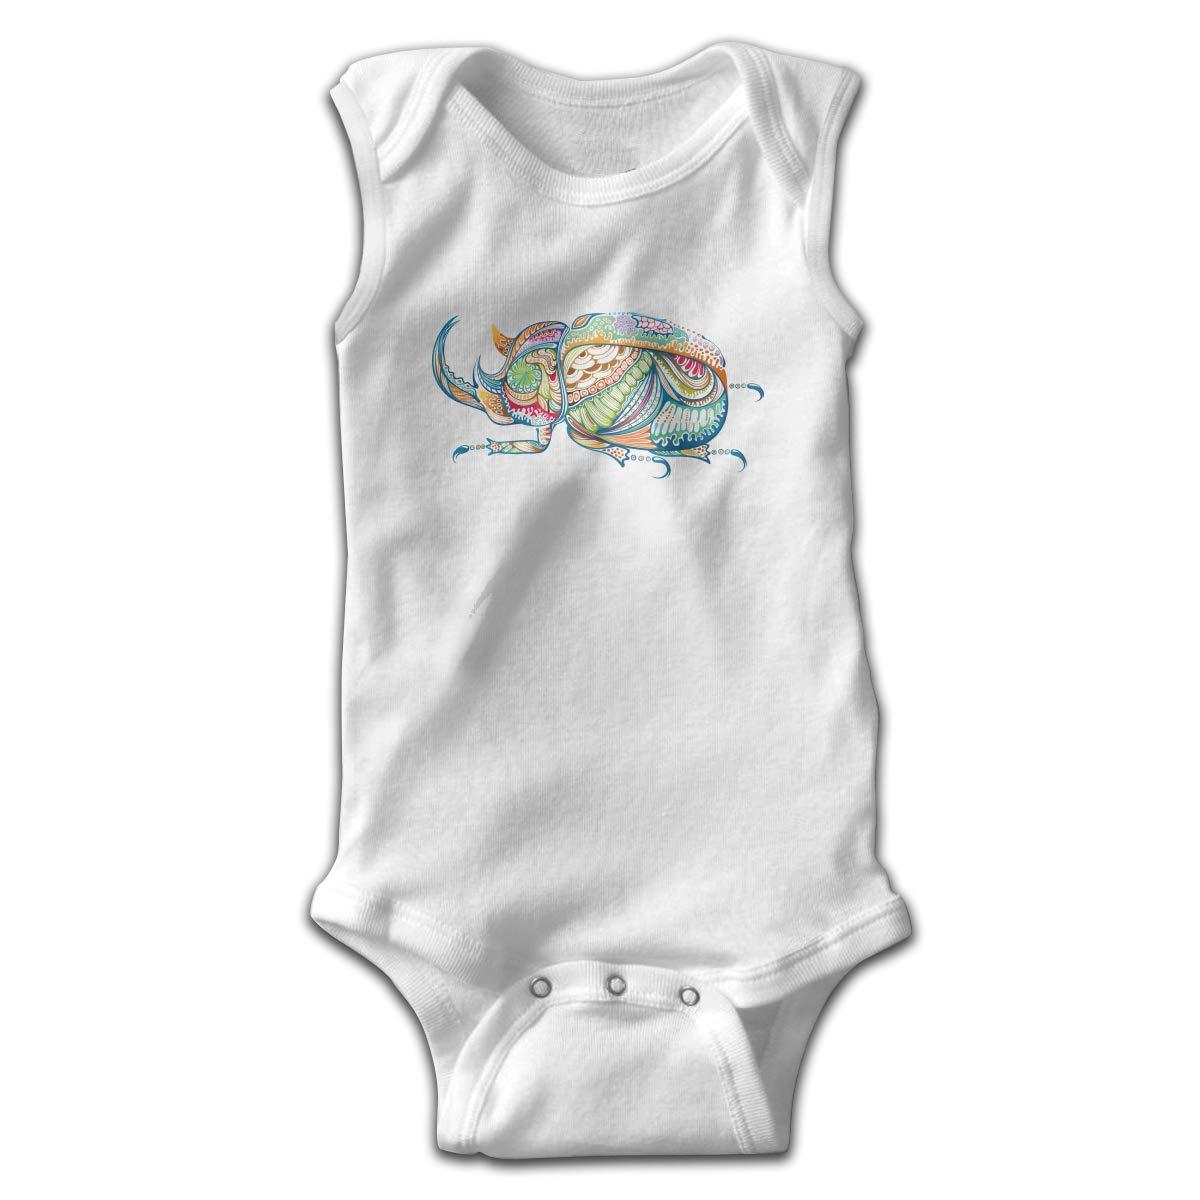 Creative Artistic Colorful The Beetle Newborn Crawling Suit Sleeveless Romper Bodysuit Onesies Jumpsuit Black